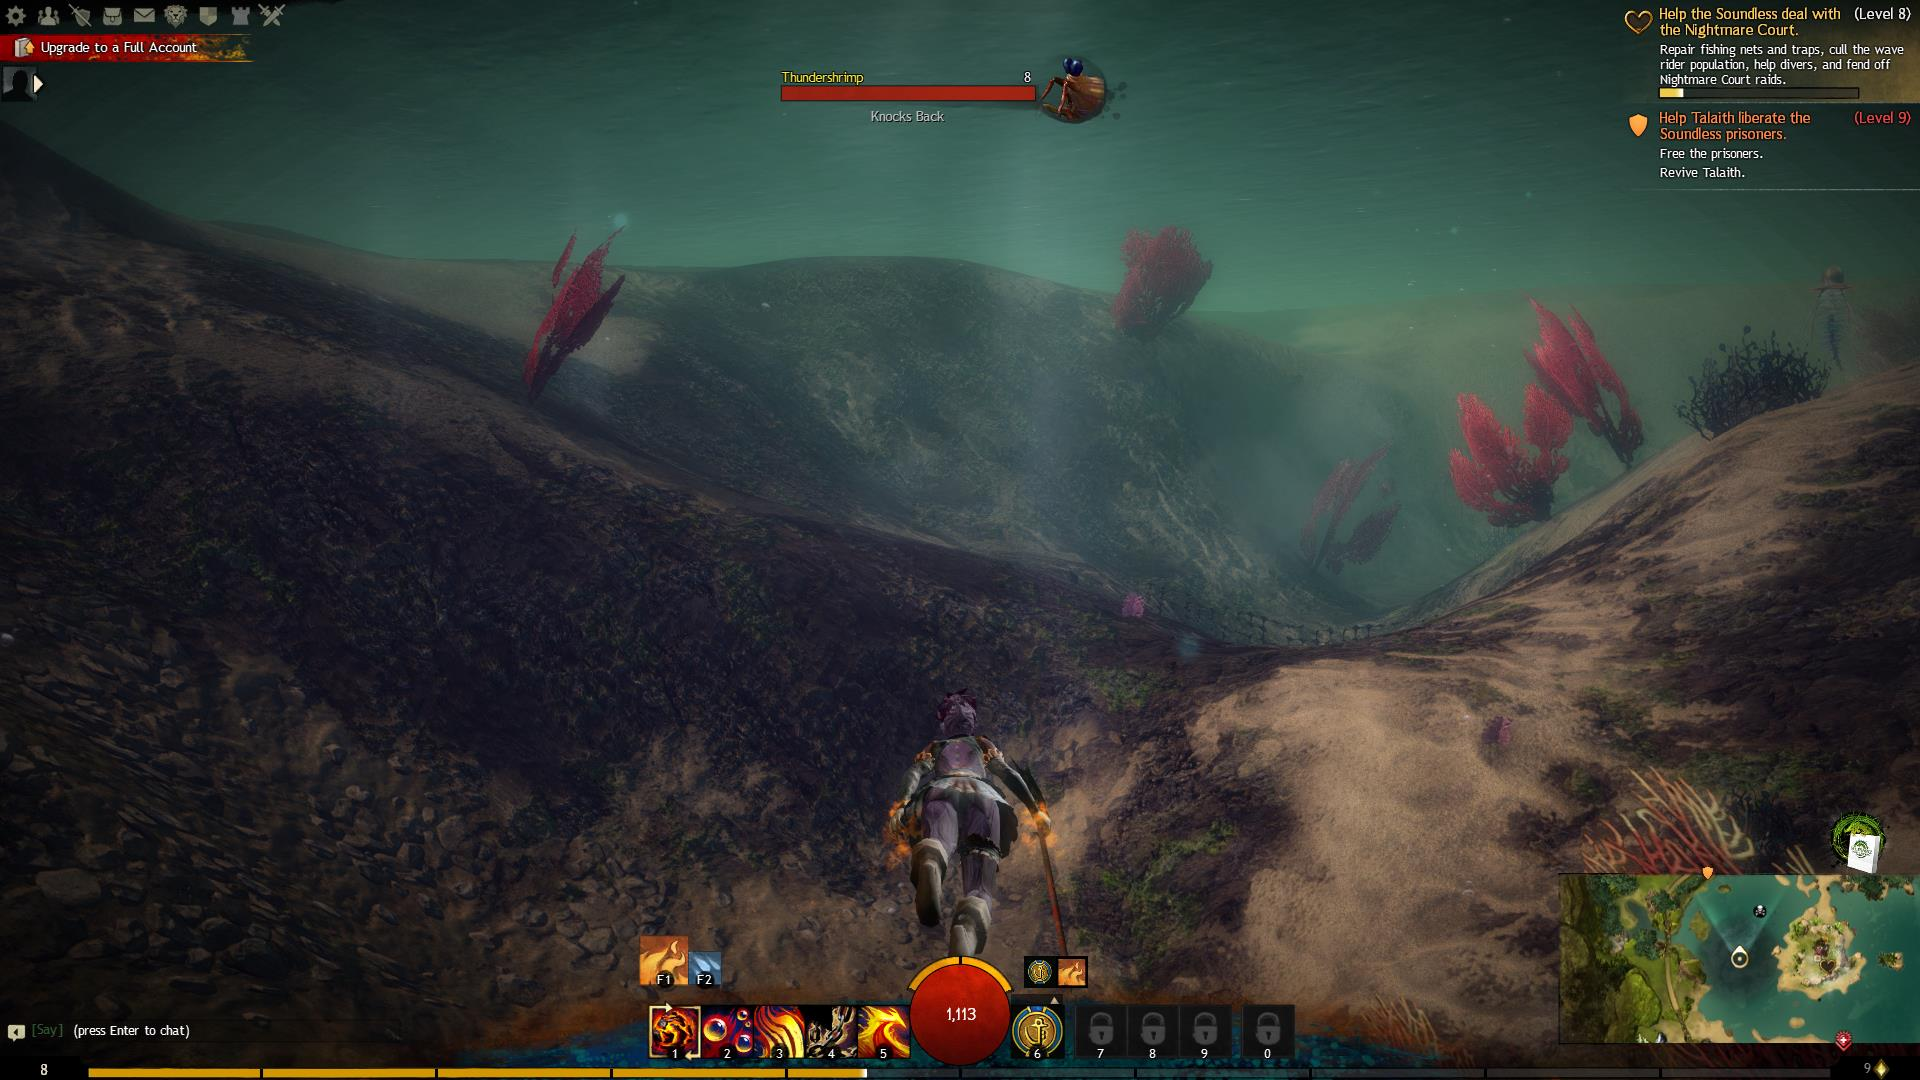 Путешествие по Guild Wars 2     Знакомство: Billionyx | Паб | Канобу